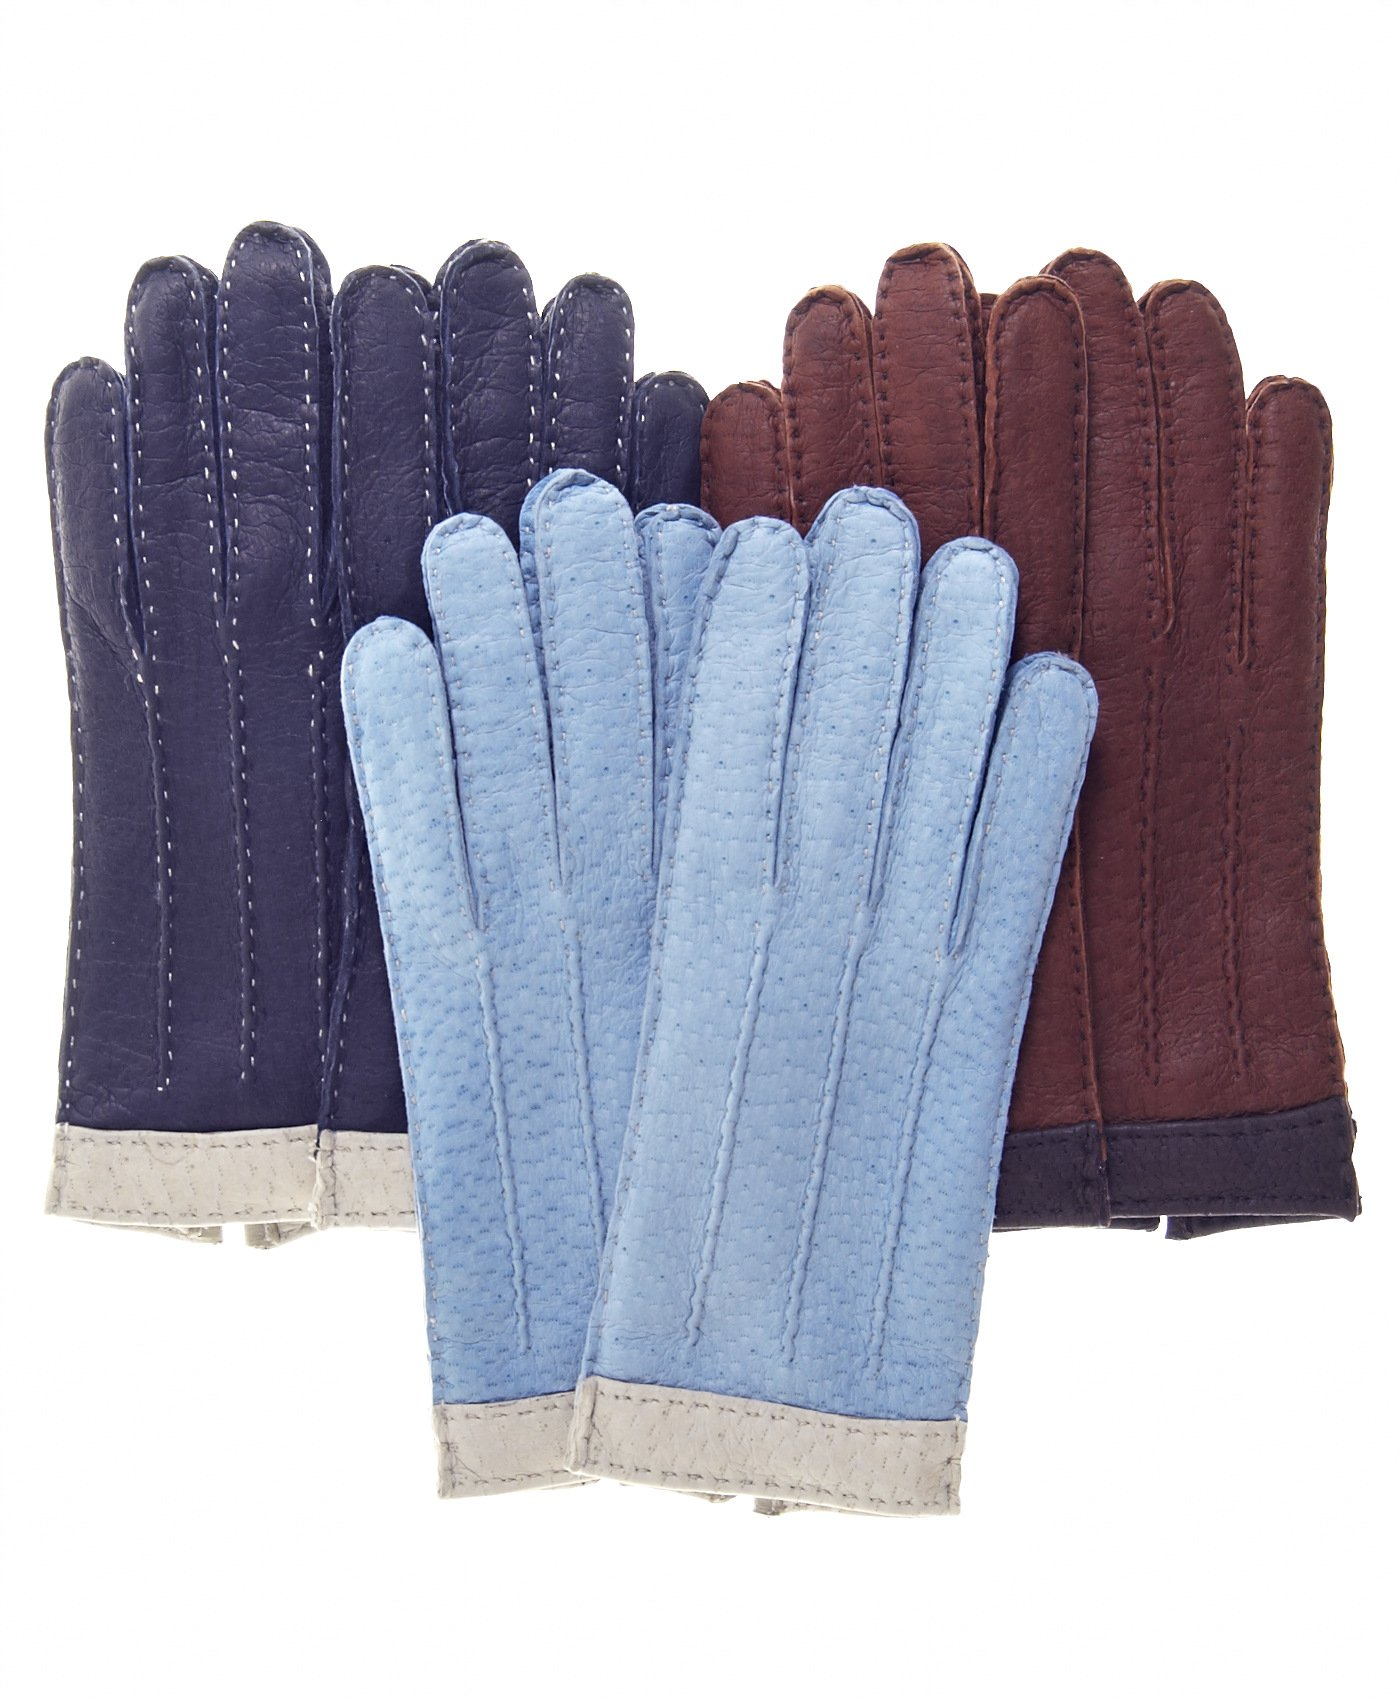 Fratelli Orsini Women's Italian Cashmere Lined Peccary Gloves Size 7 1/2 Color Cork by Fratelli Orsini (Image #1)